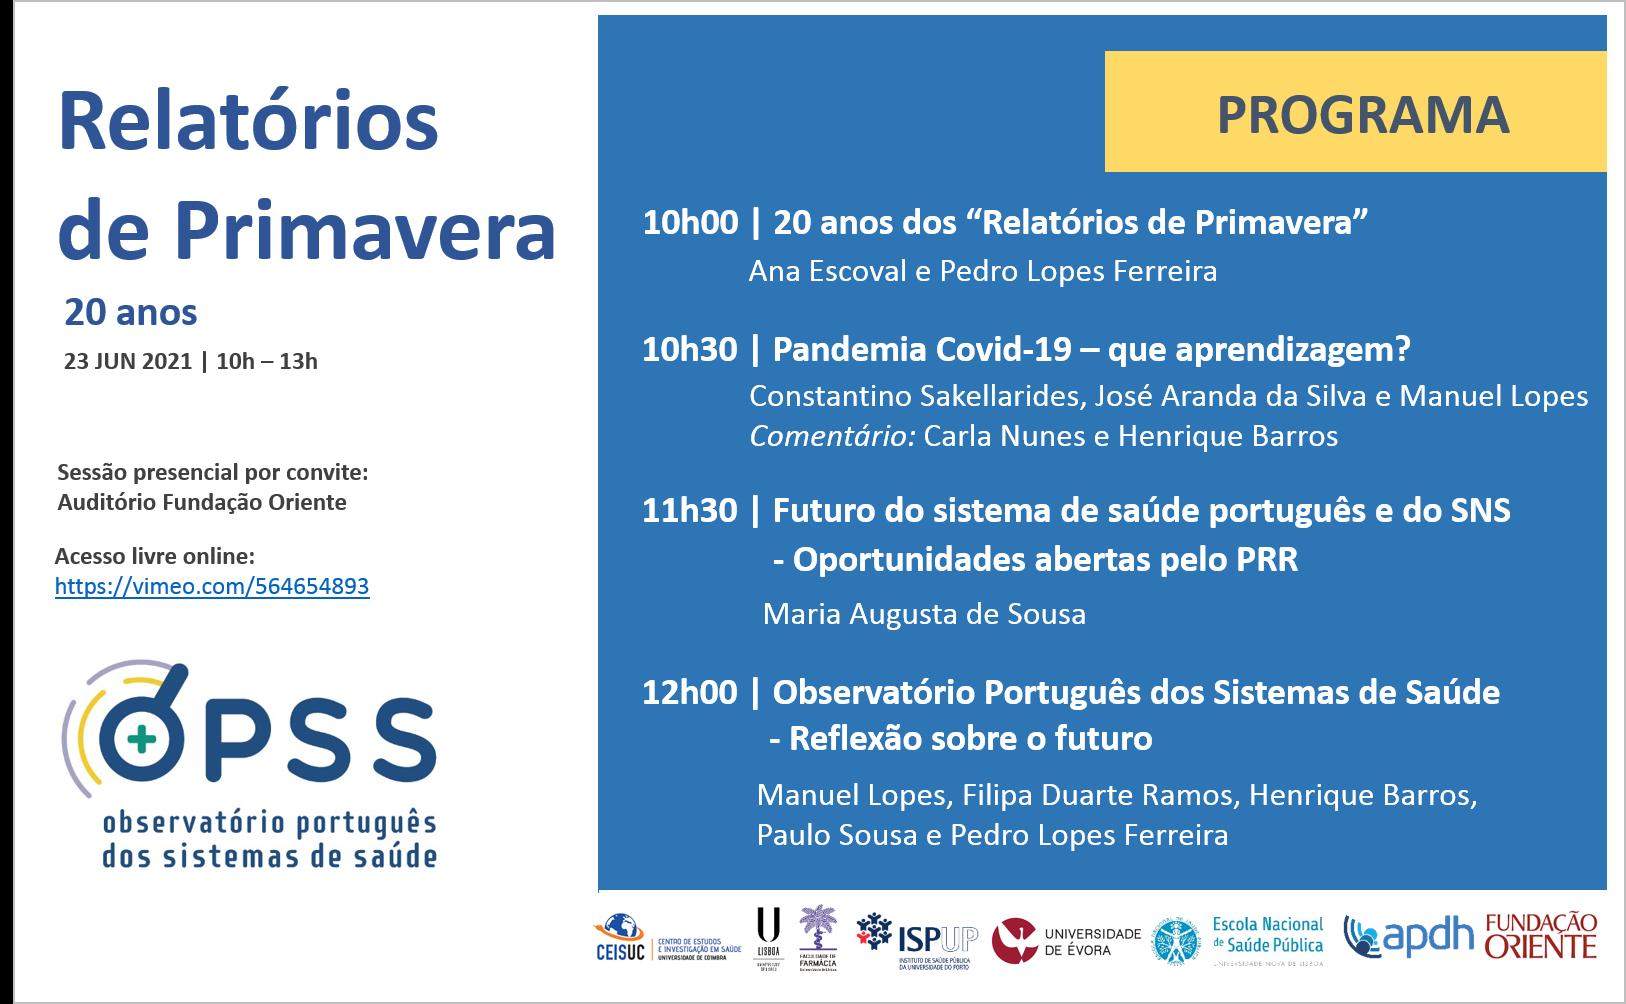 OPSS_Programa final.png